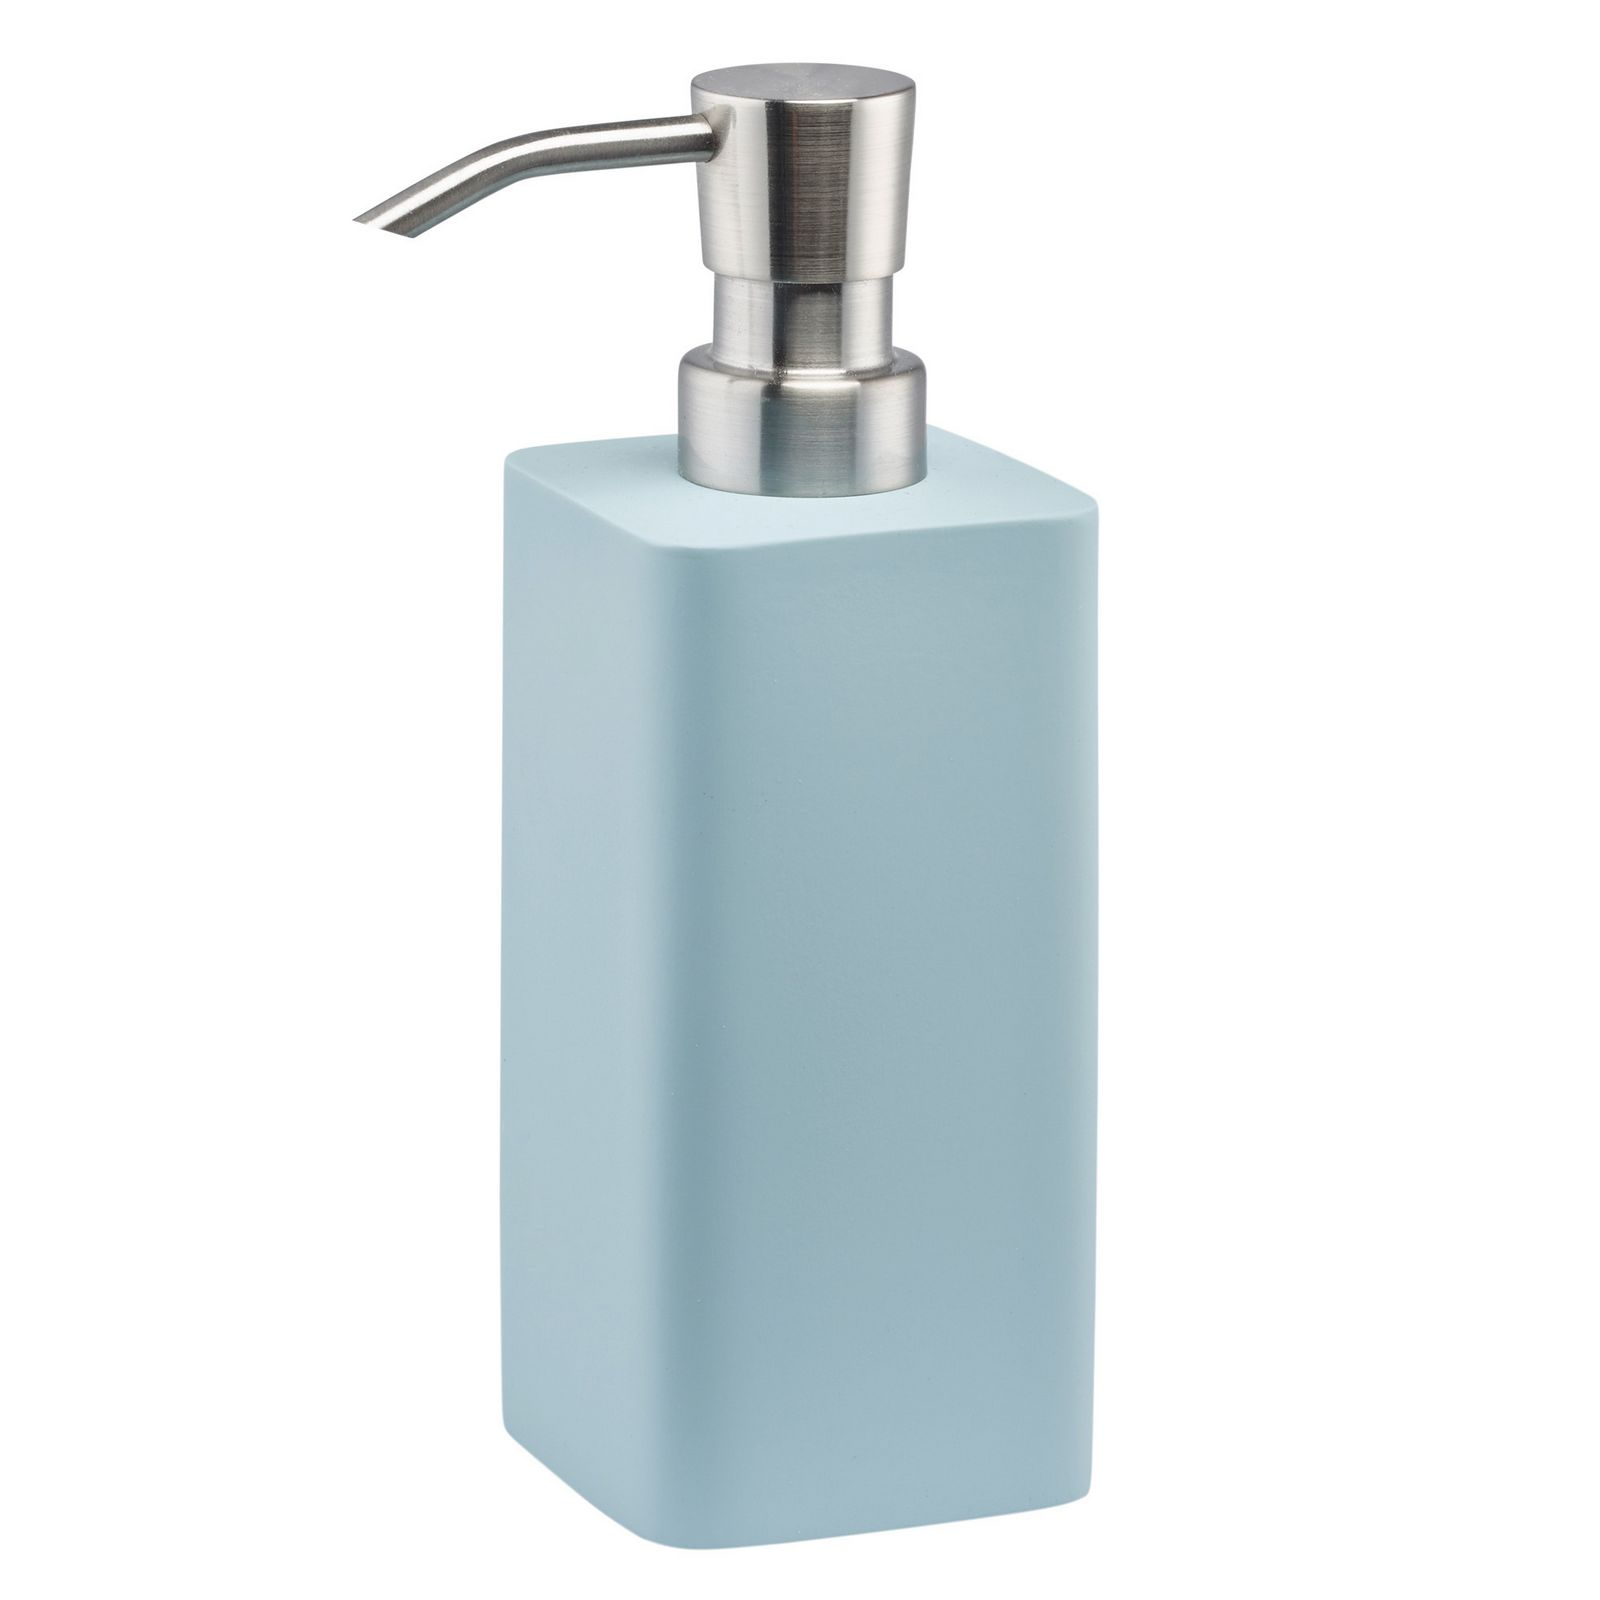 Диспенсер для мыла Aquanova ONADIL-369